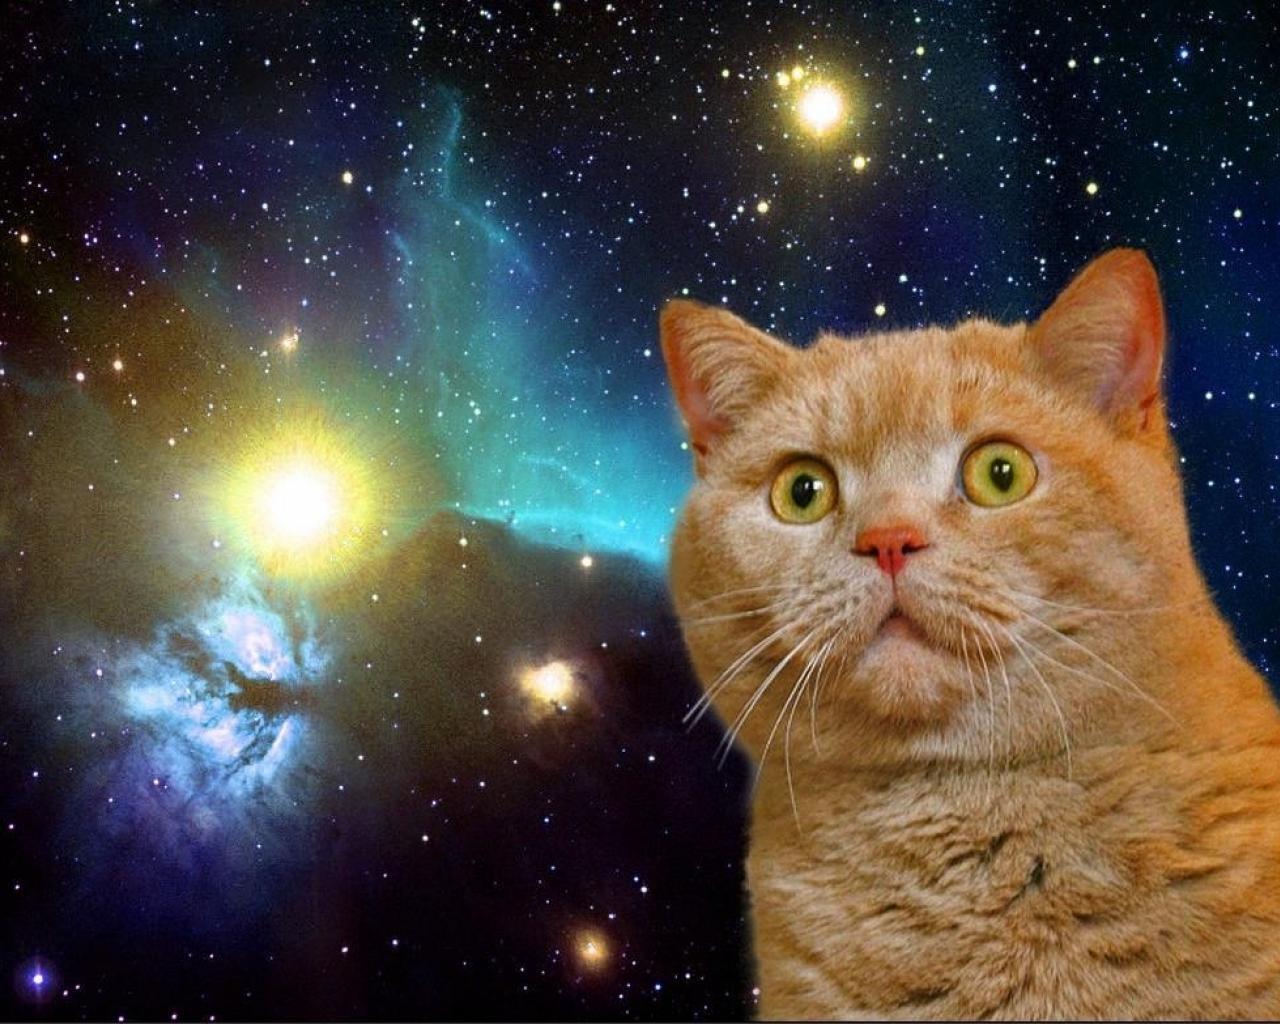 1280x1024 Cat In Space Wallpaper 1280x783